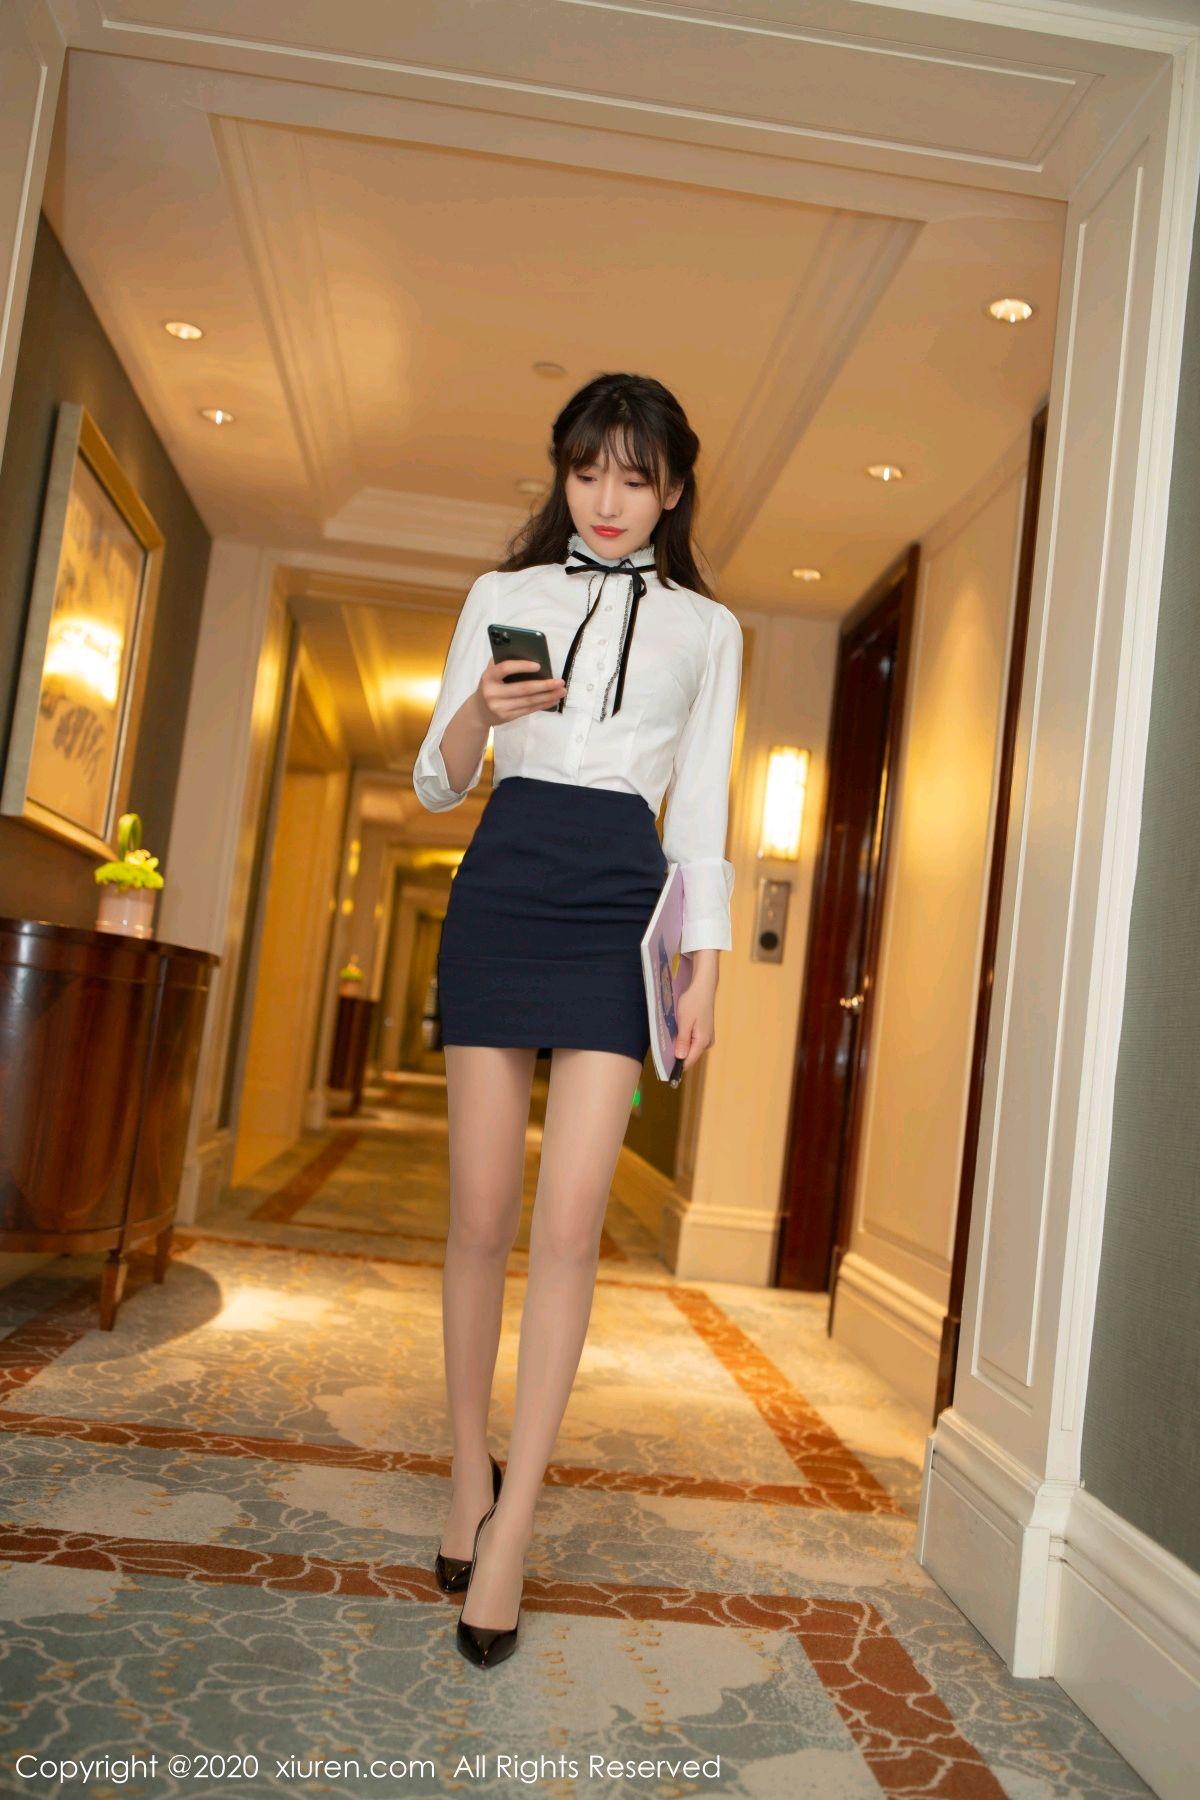 [XiuRen] Vol.2626 Secrets in mobile phones 1P, Chen Xiao Miao, Lu Xuan Xuan, School Uniform, Sisters, Xiuren